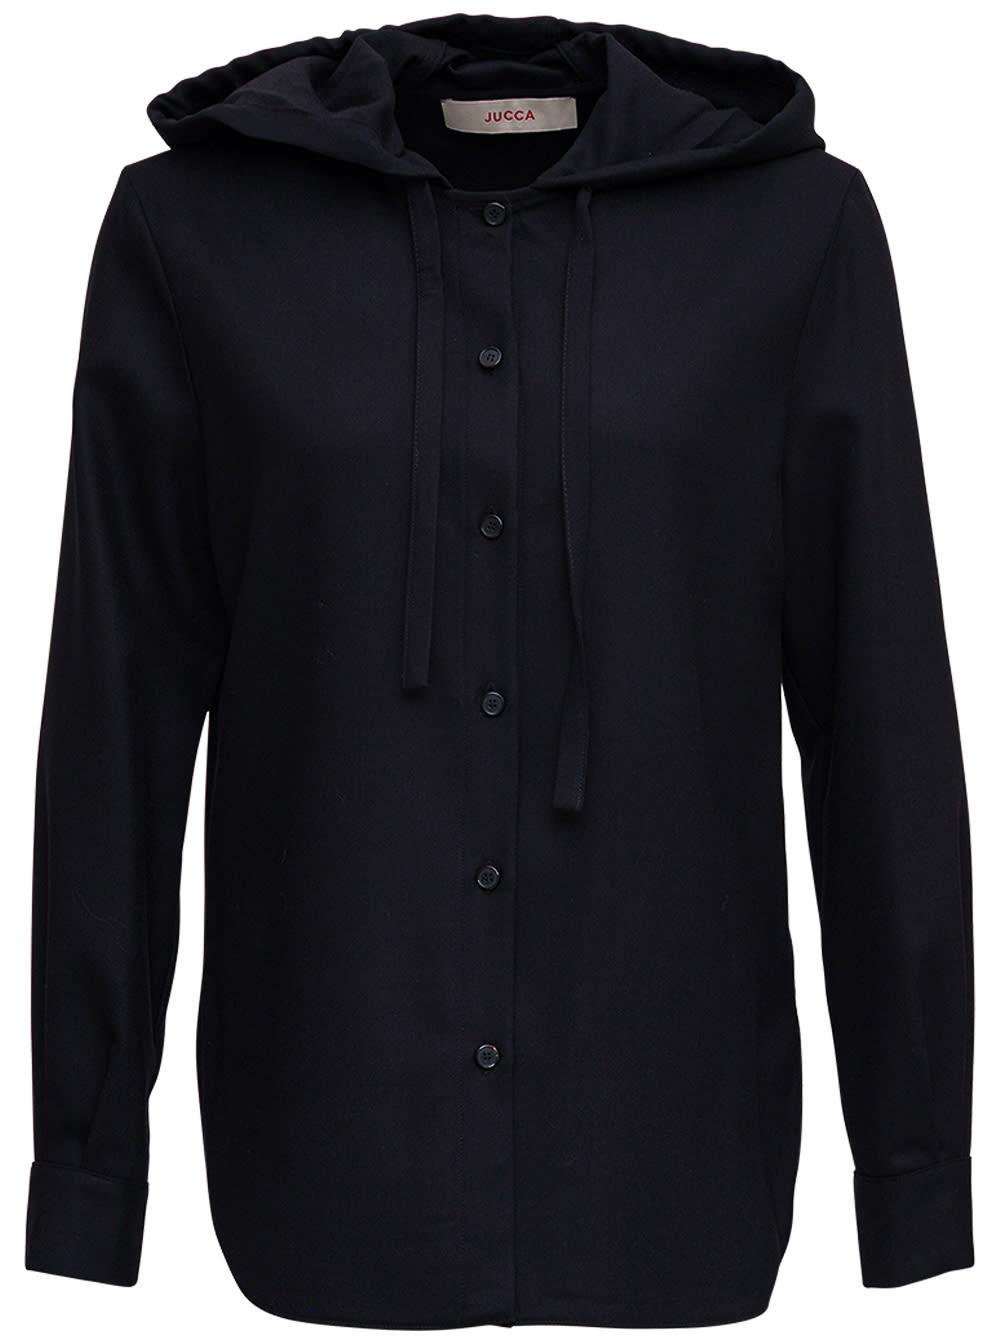 Black Wool Blend Hooded Shirt